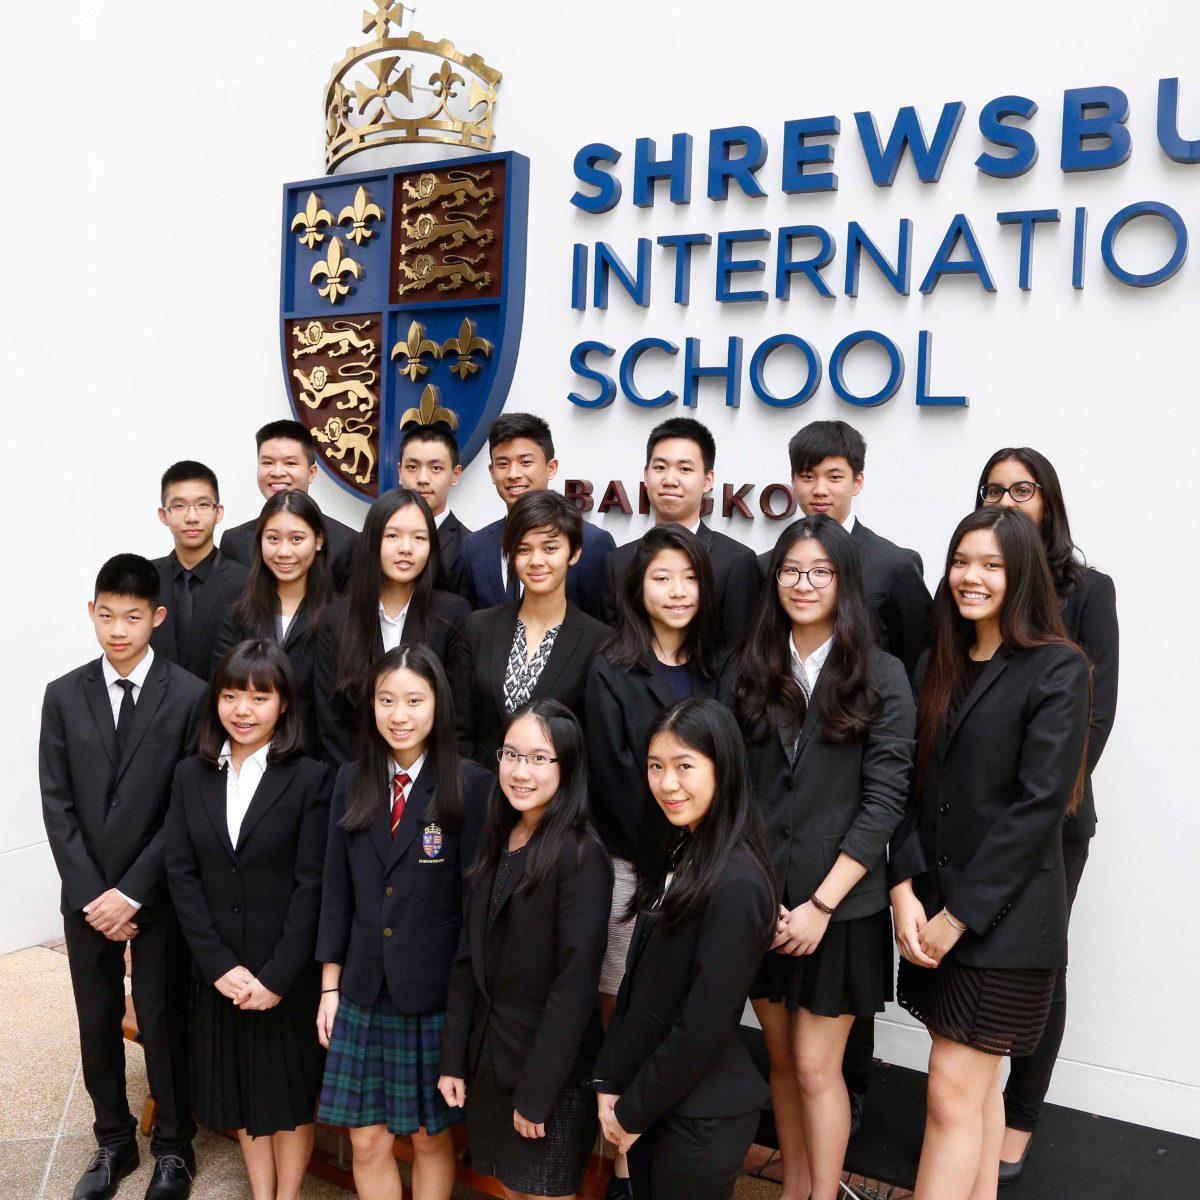 student of Shrewsbury International School